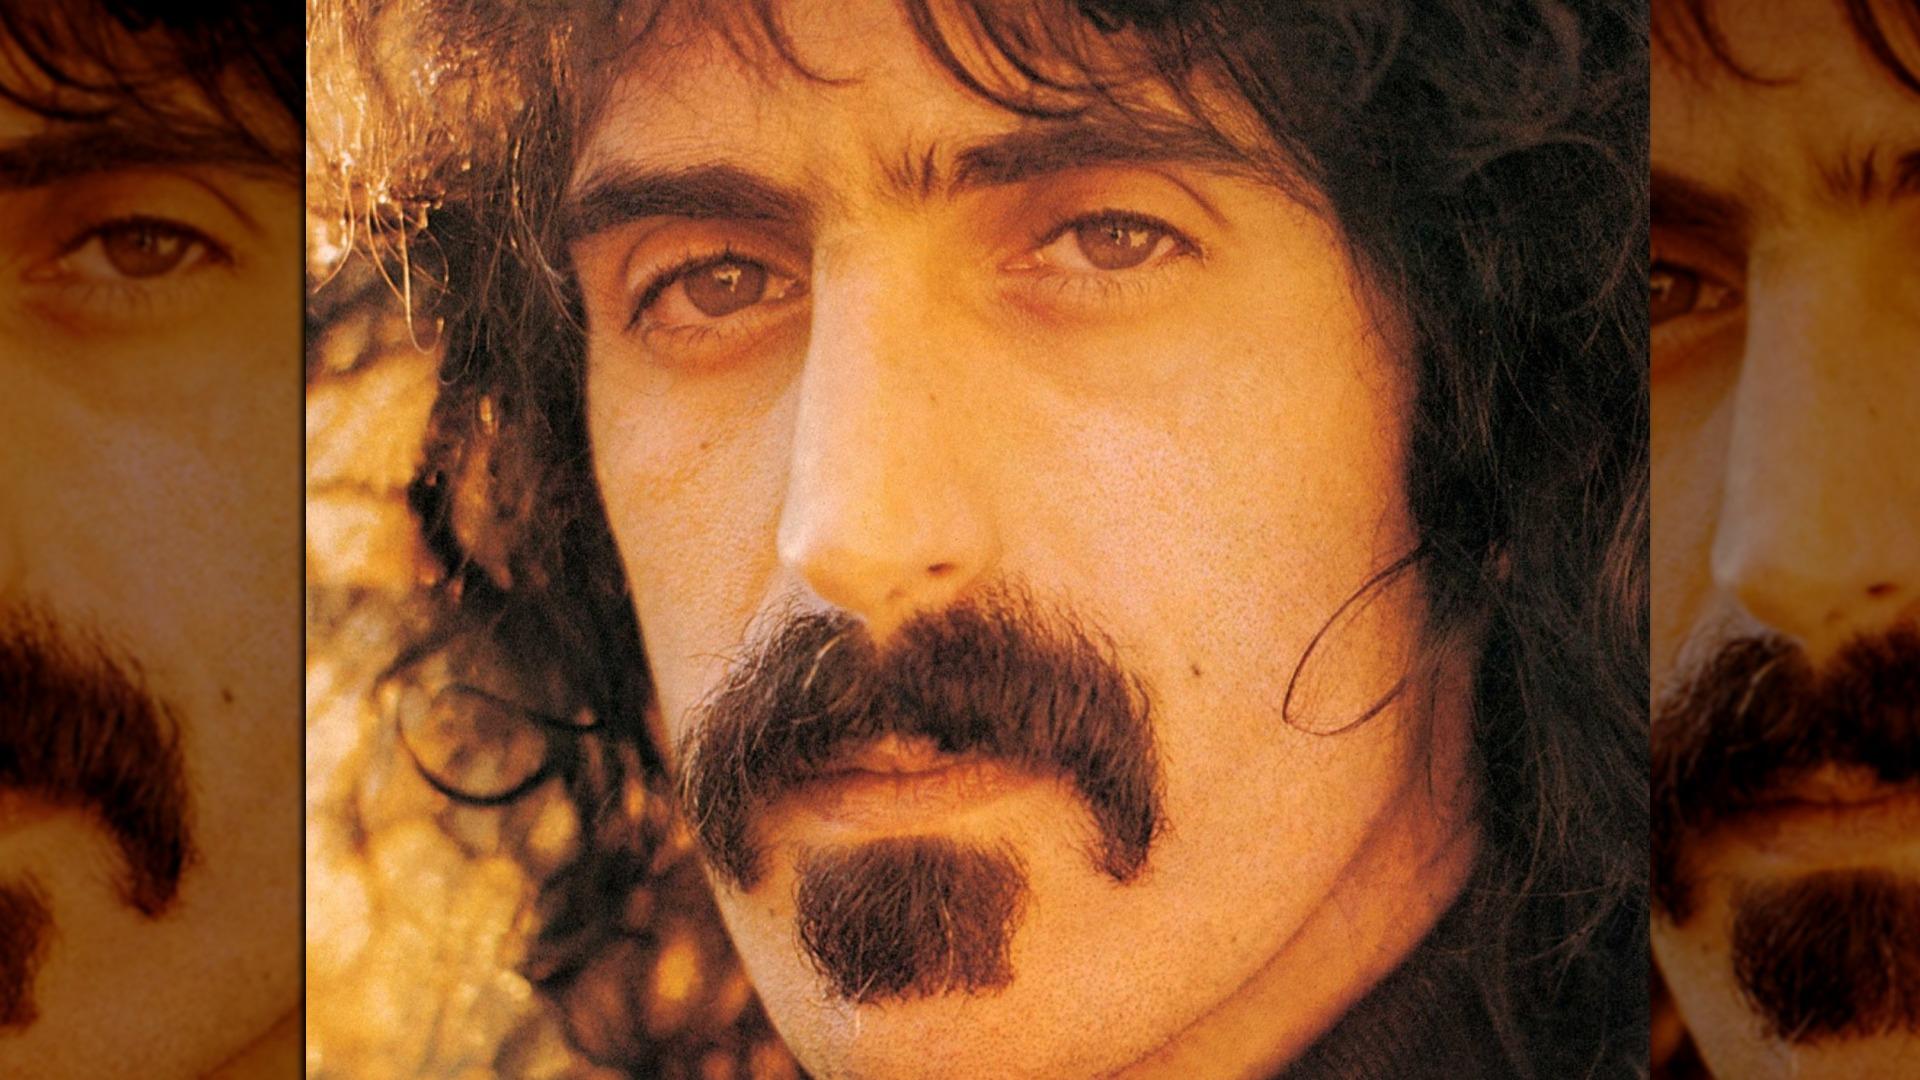 The Tragic Real Life Story Of Frank Zappa